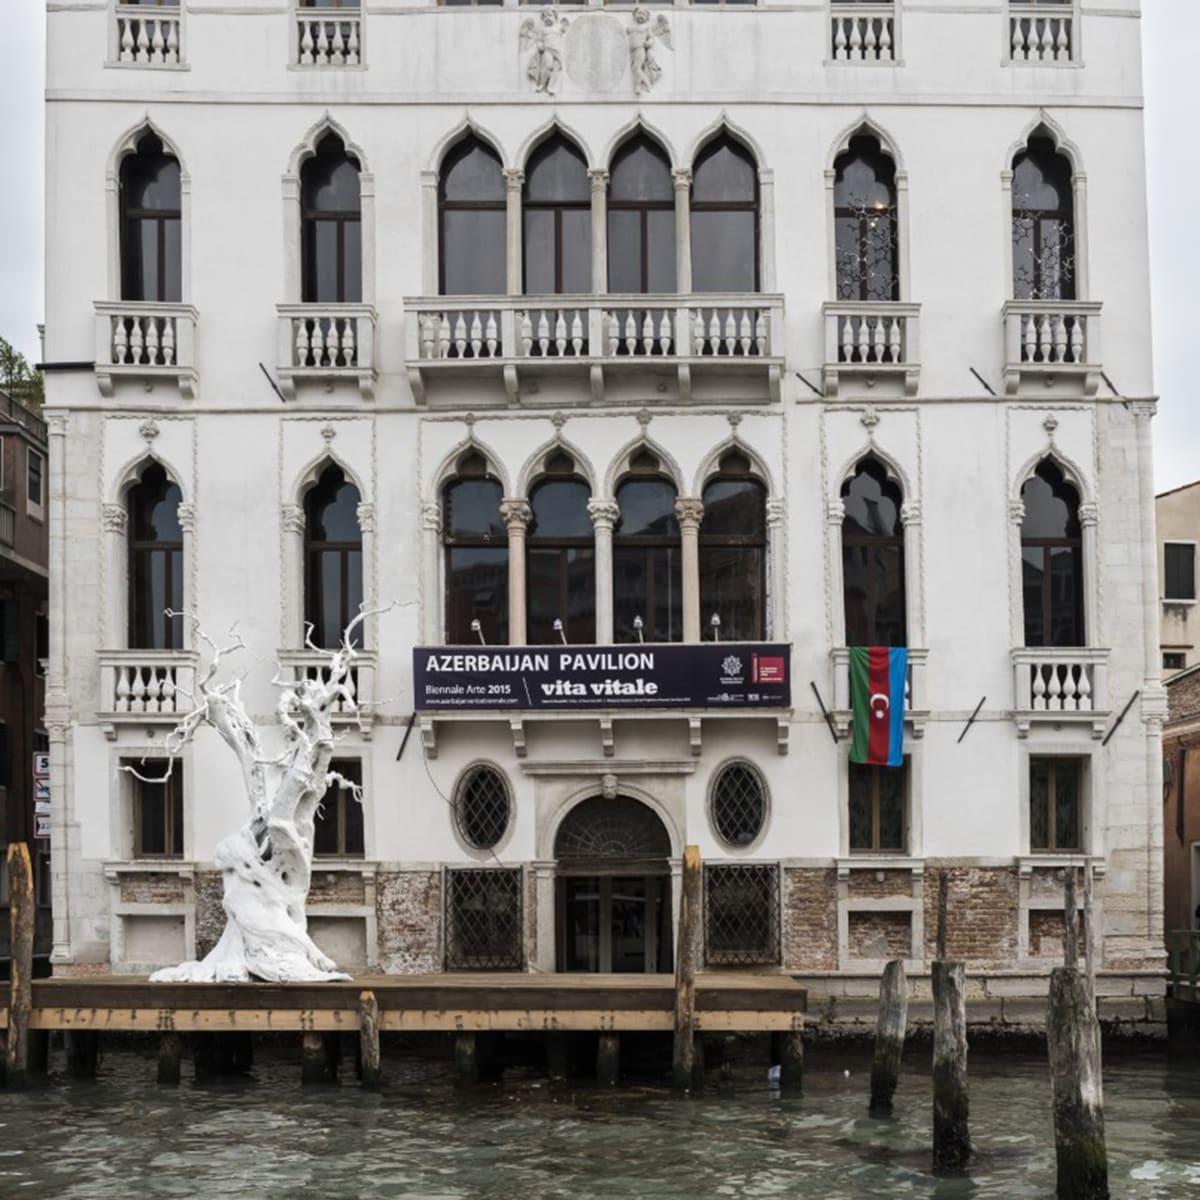 VITA VITALE (VITAL LIFE), 56th International Art Exhibition La Biennale di Venezia, Official Azerbaijan Pavilion, 2015